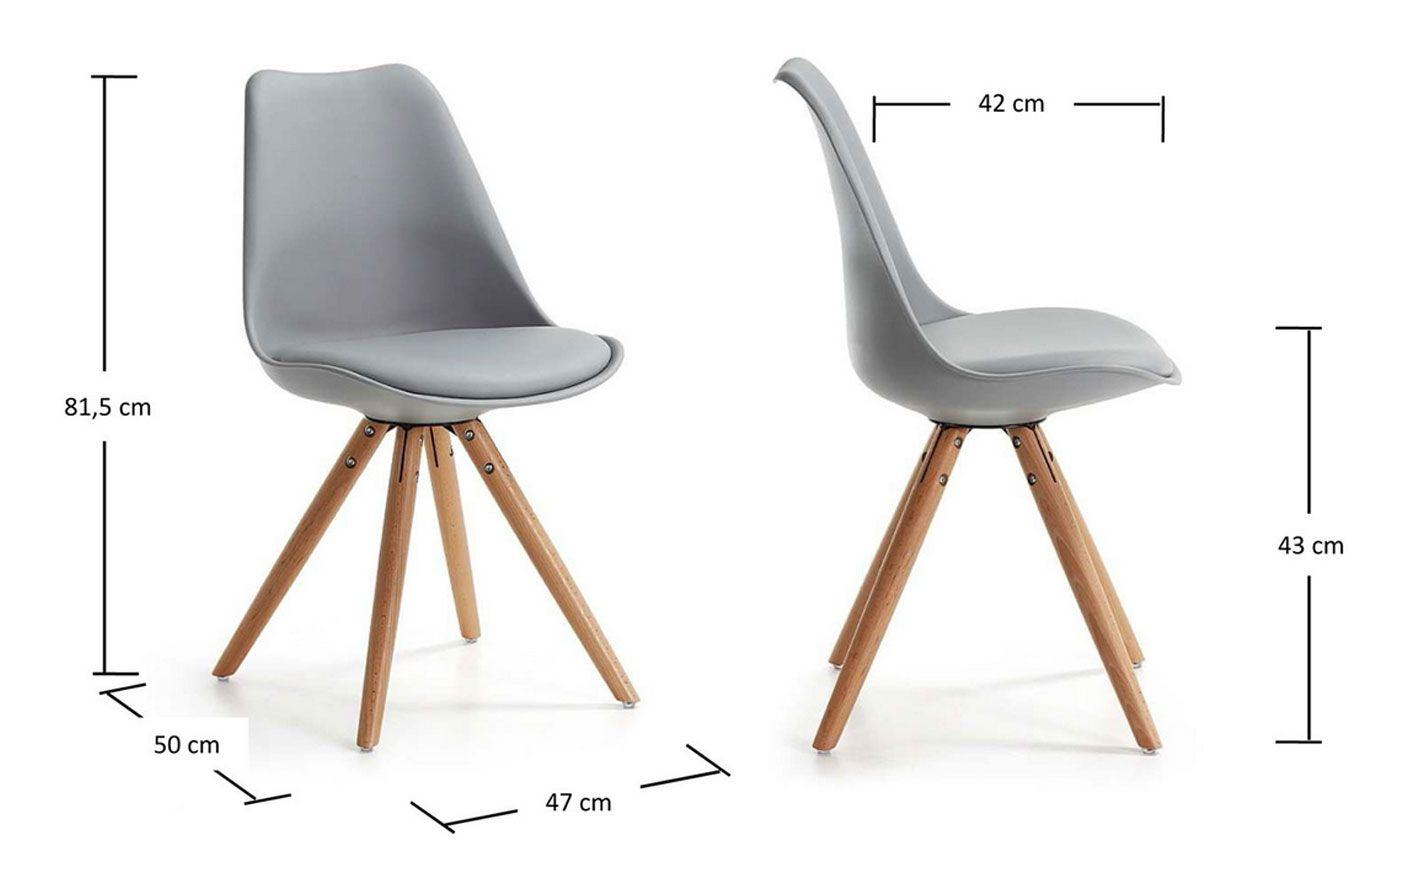 impressionnant chaise grise pied bois